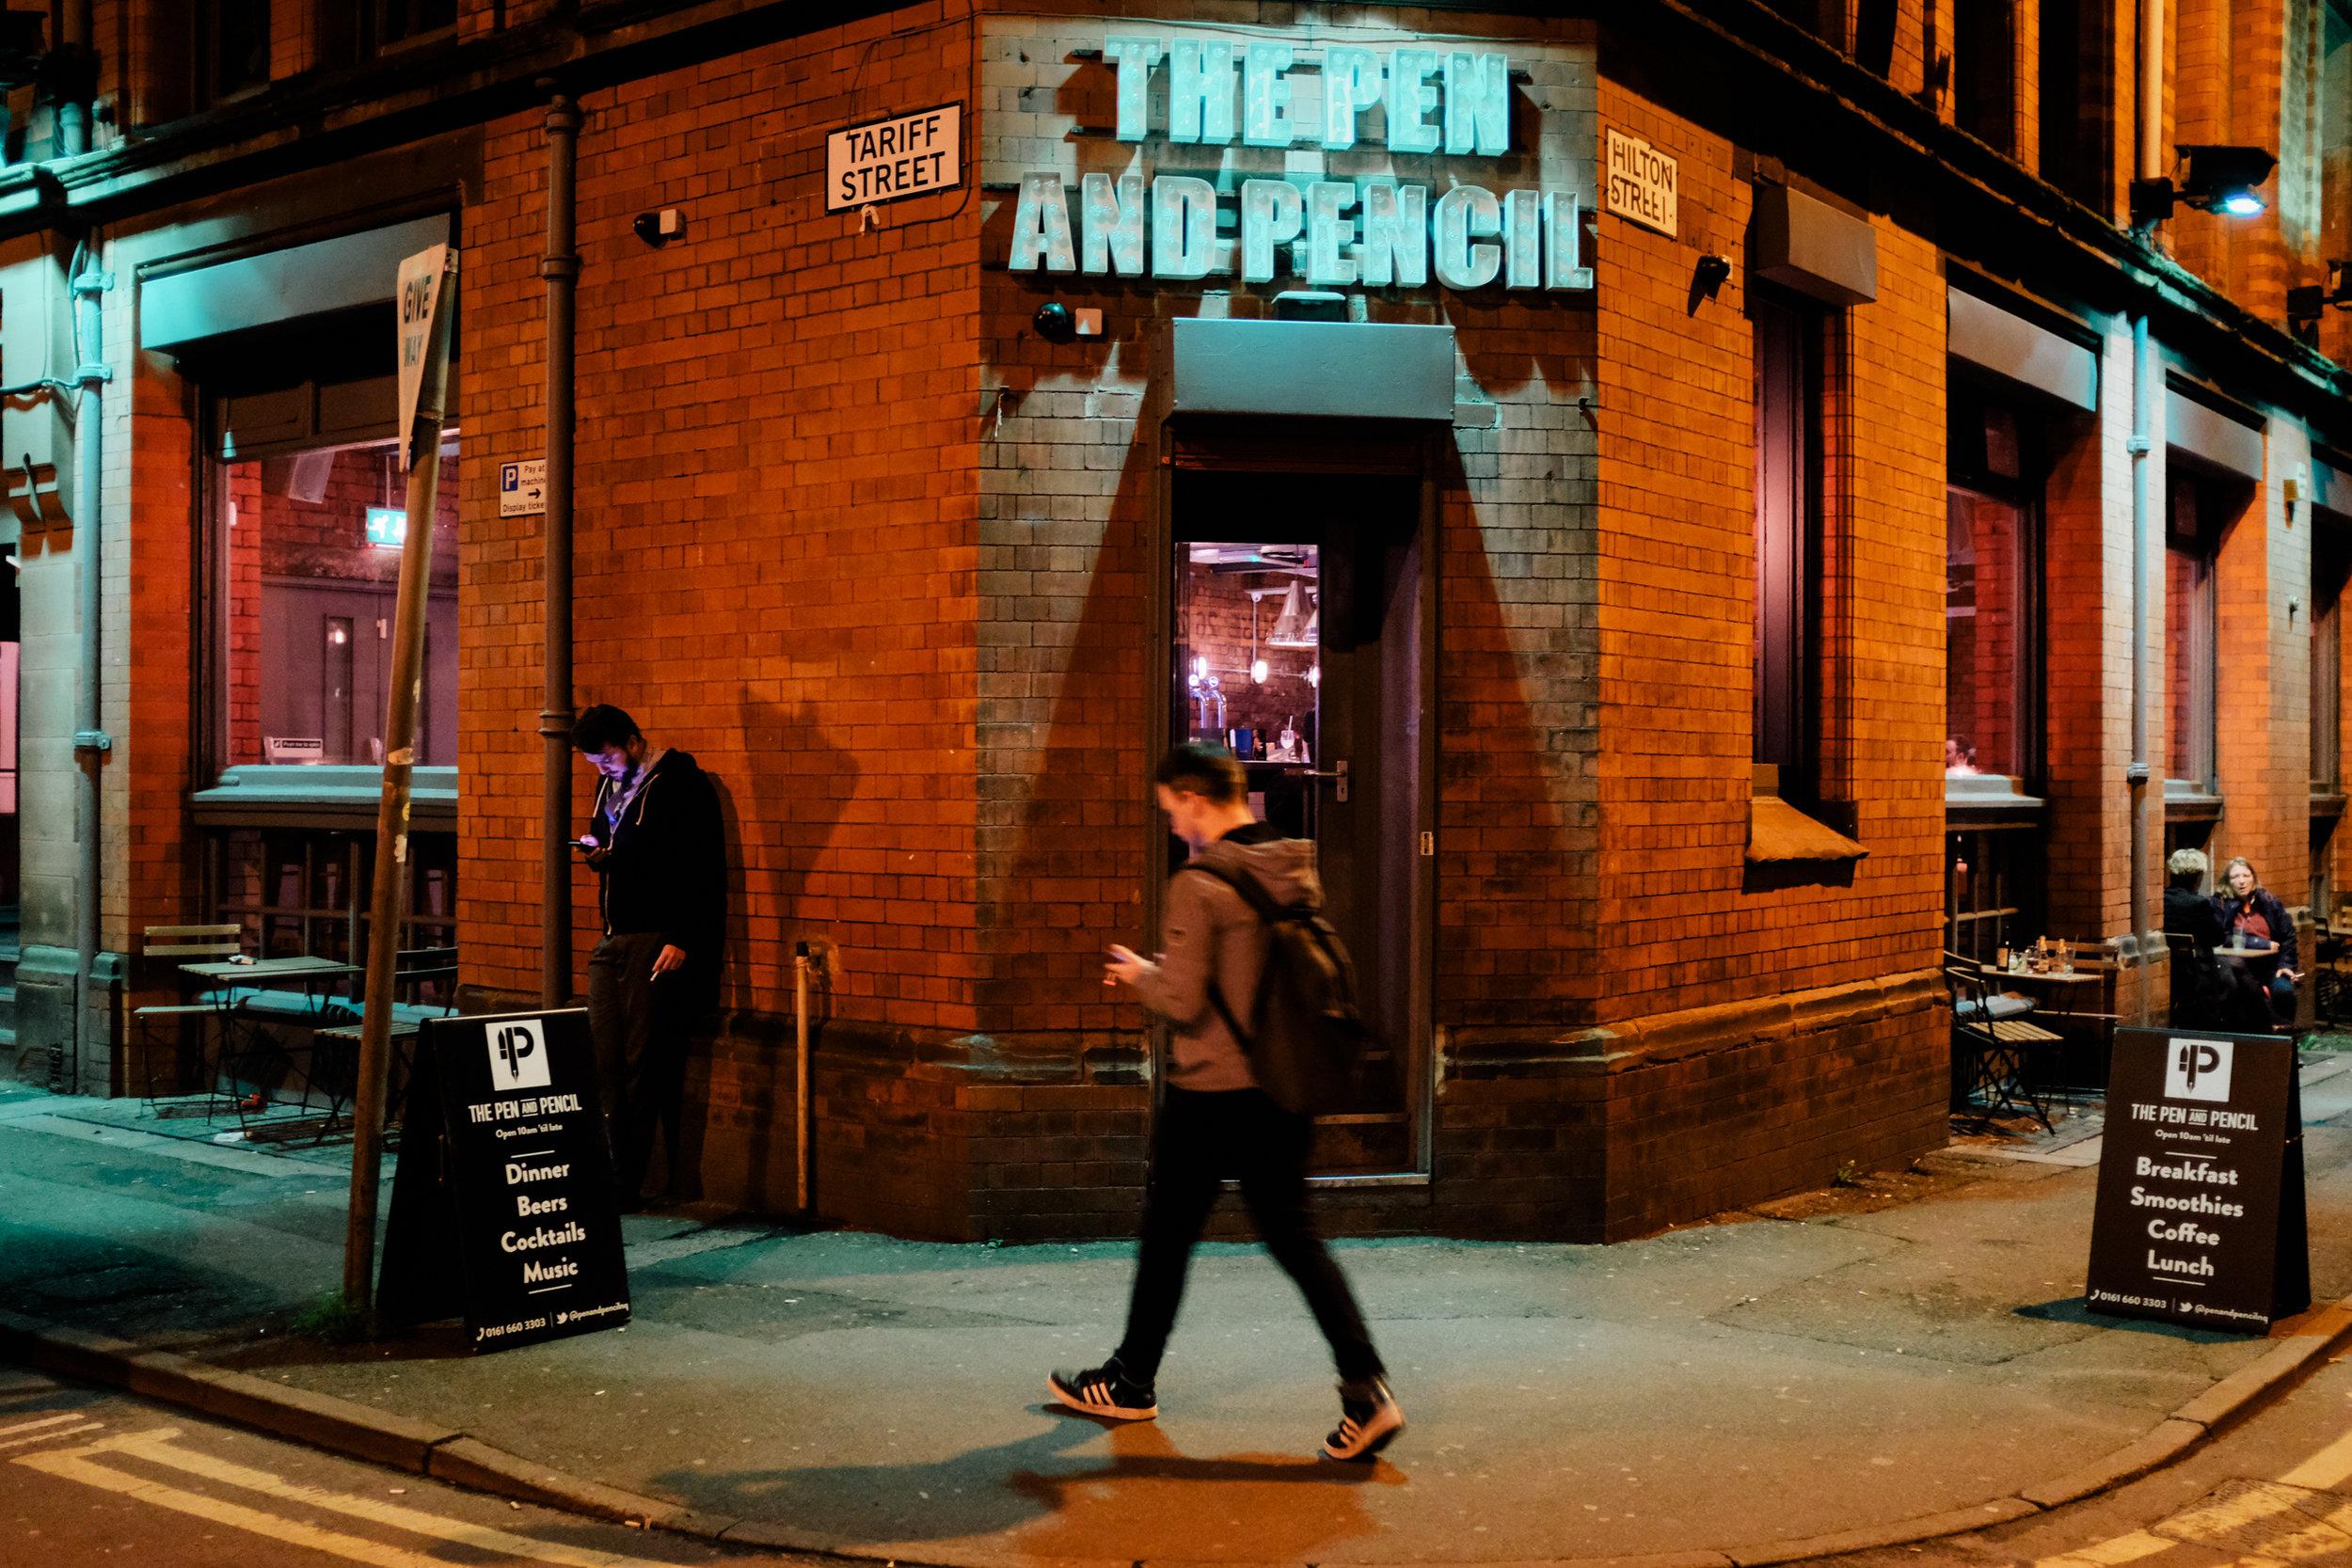 Tariff Street, Manchester